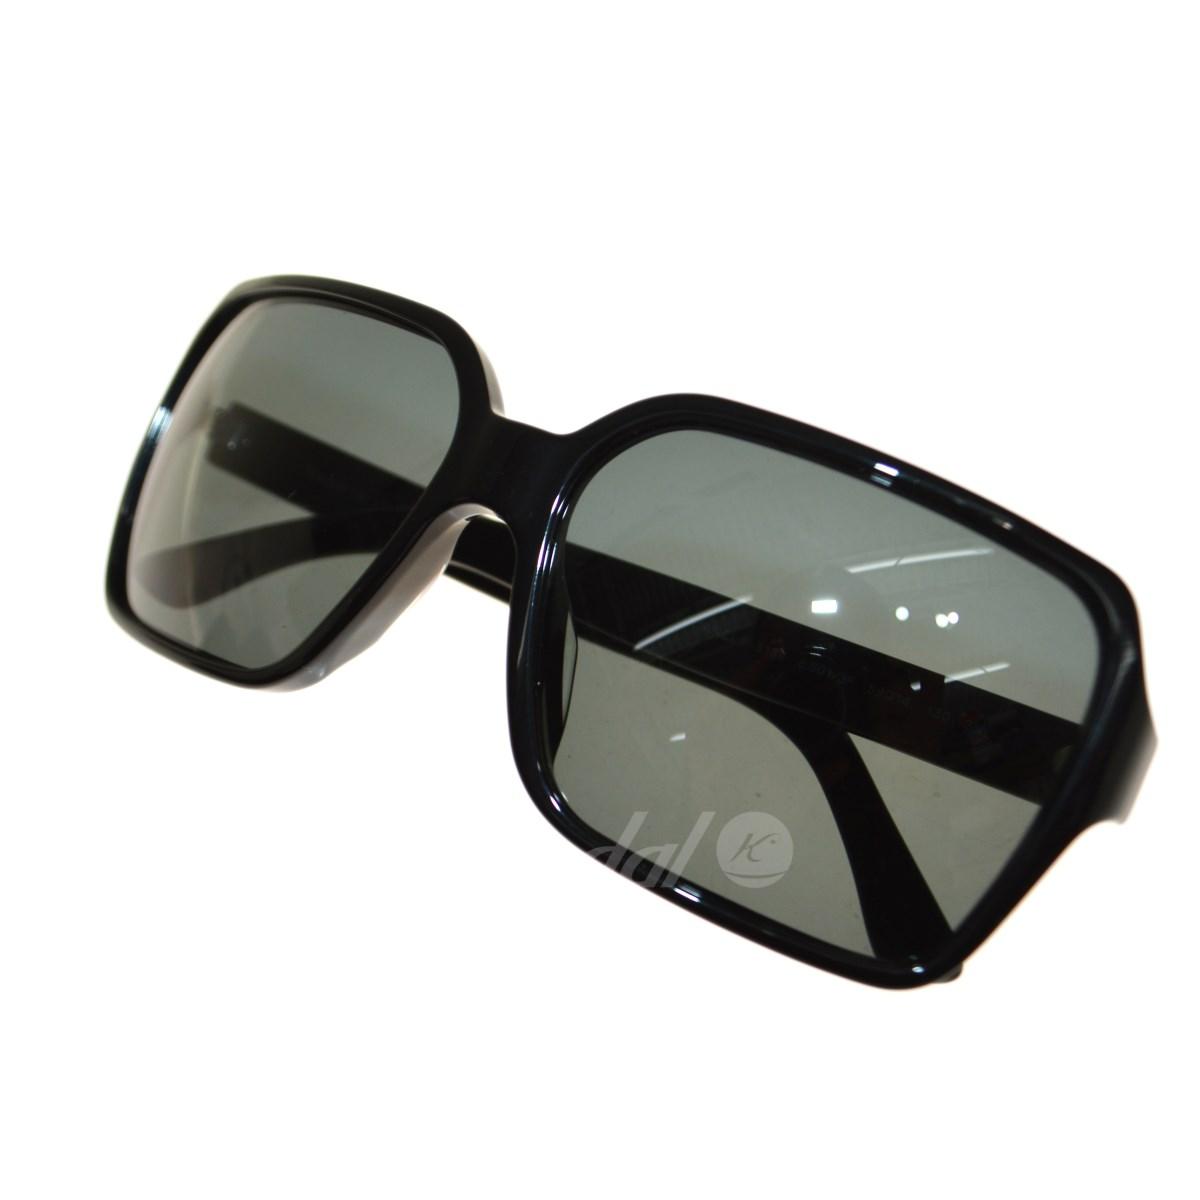 9f163d4333 ... kindal CHANEL square sunglasses Rakuten Global Market